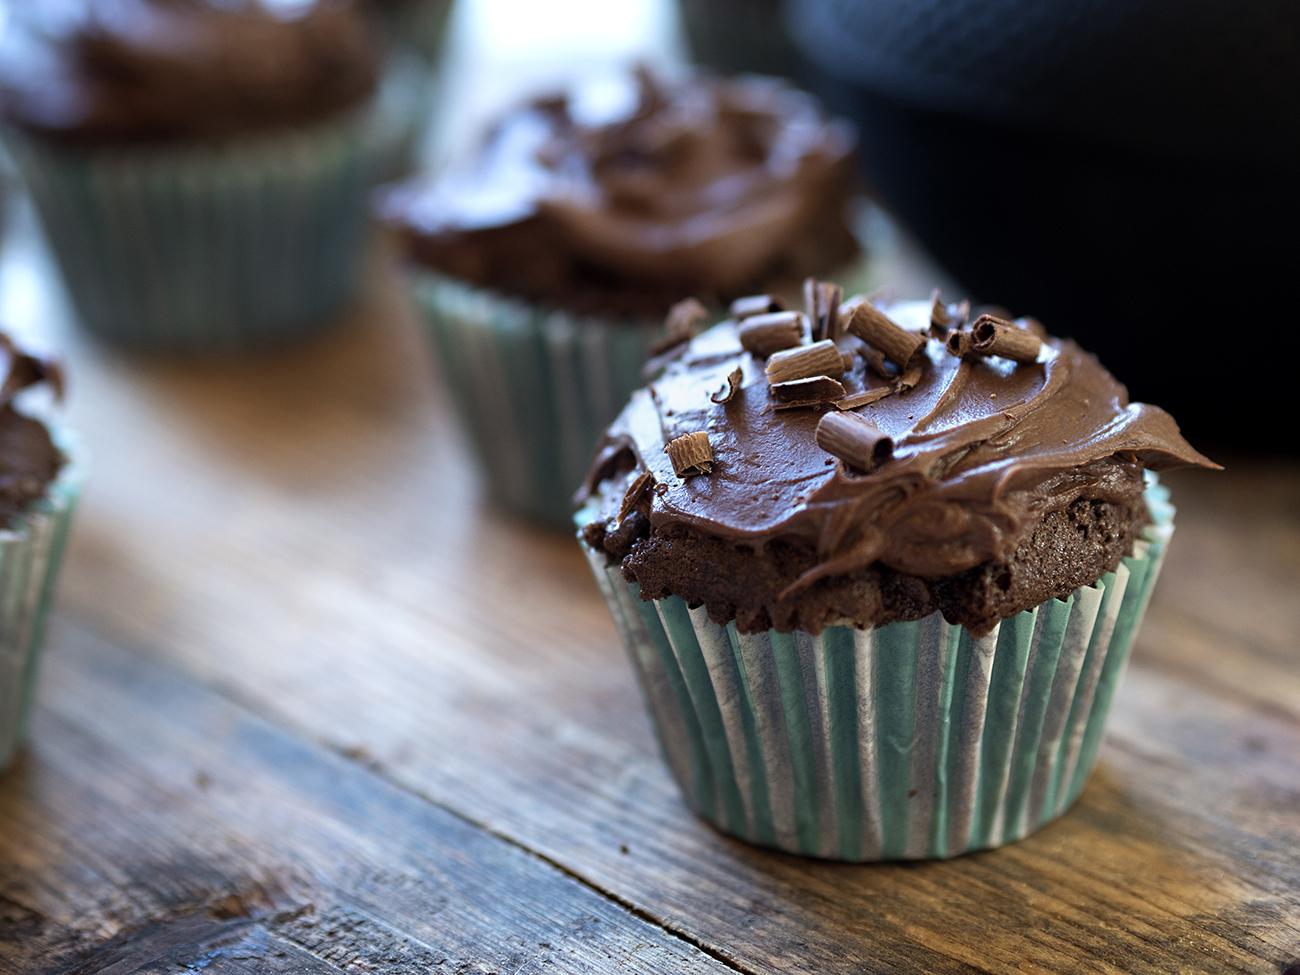 sjokoladecupcake med sjokoladeglasur